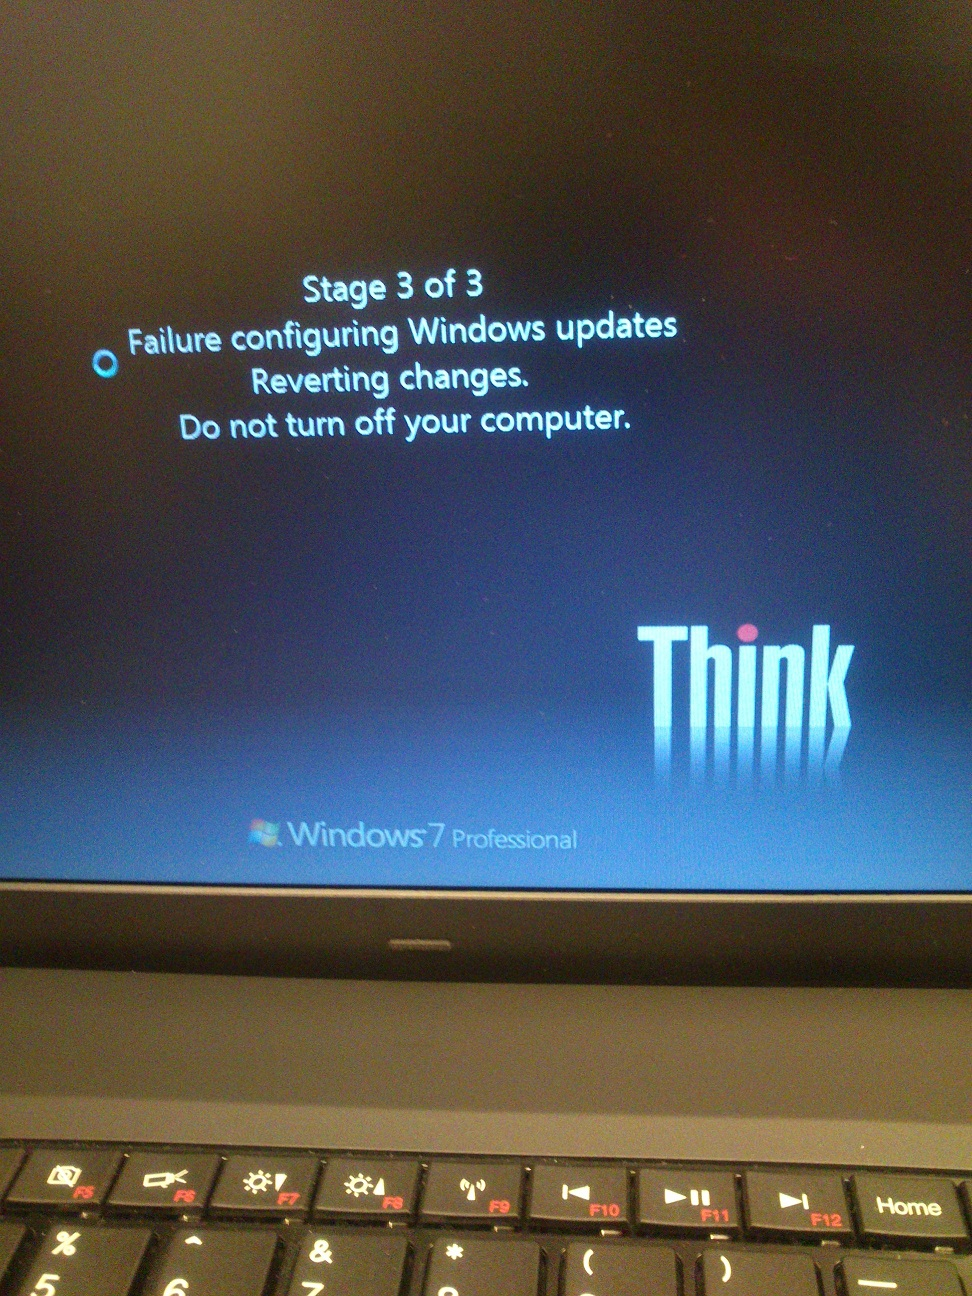 failure configuring windows updates reverting changes windows 7